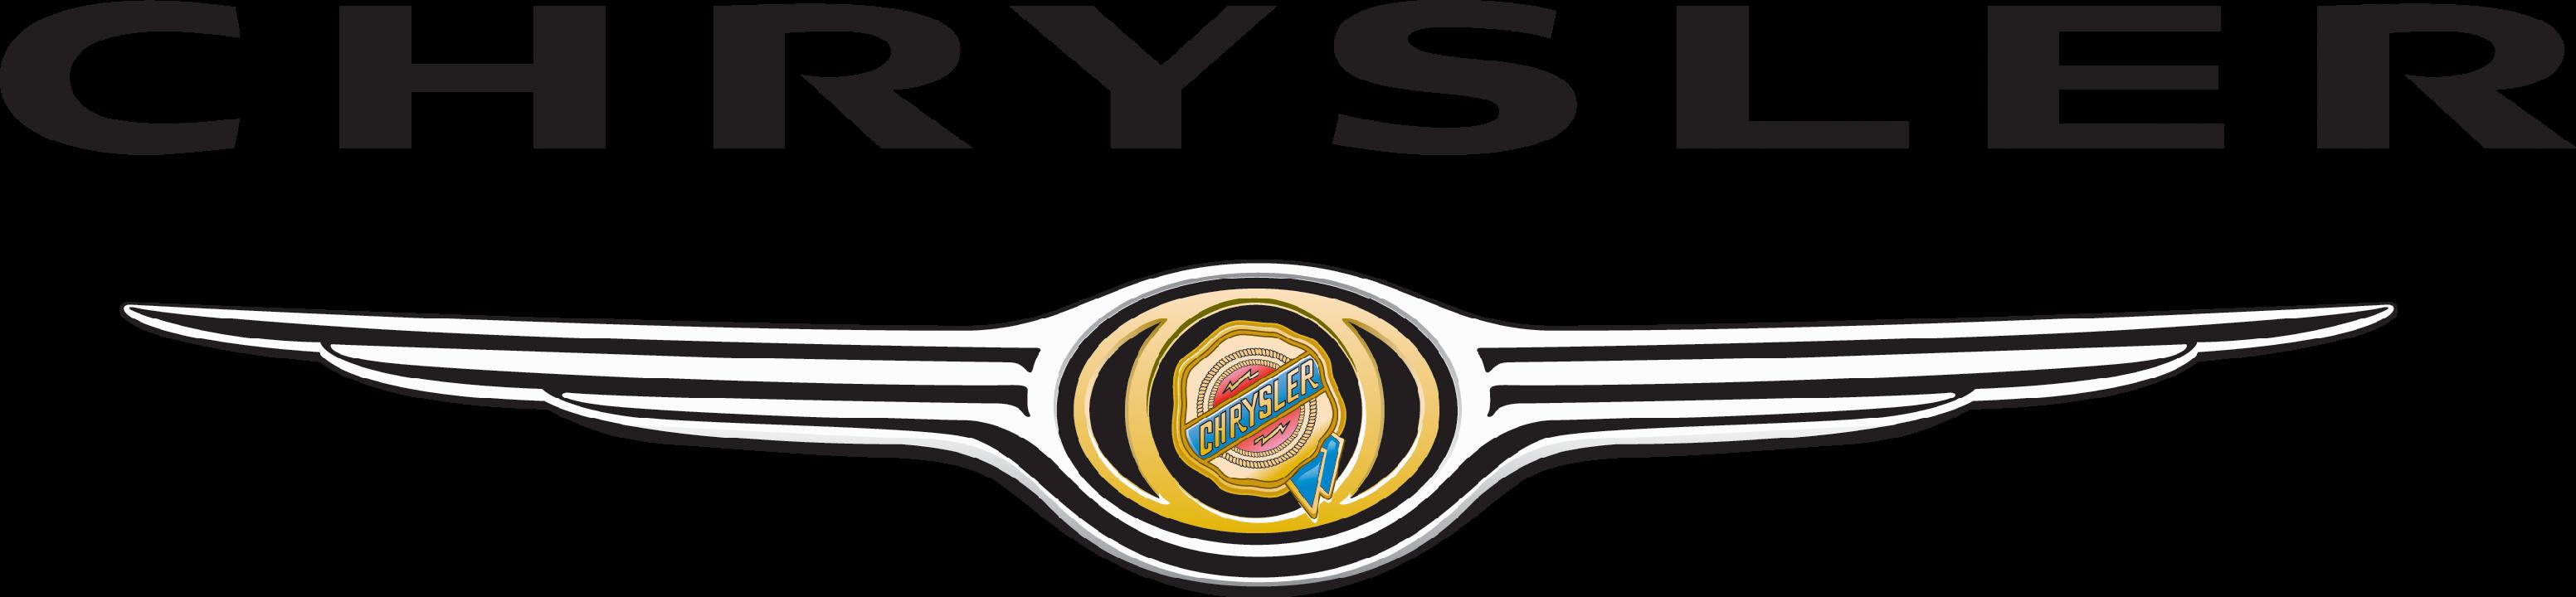 chrysler 300 logos rh logolynx com daimler chrysler logo vector logo chrysler vectoriel